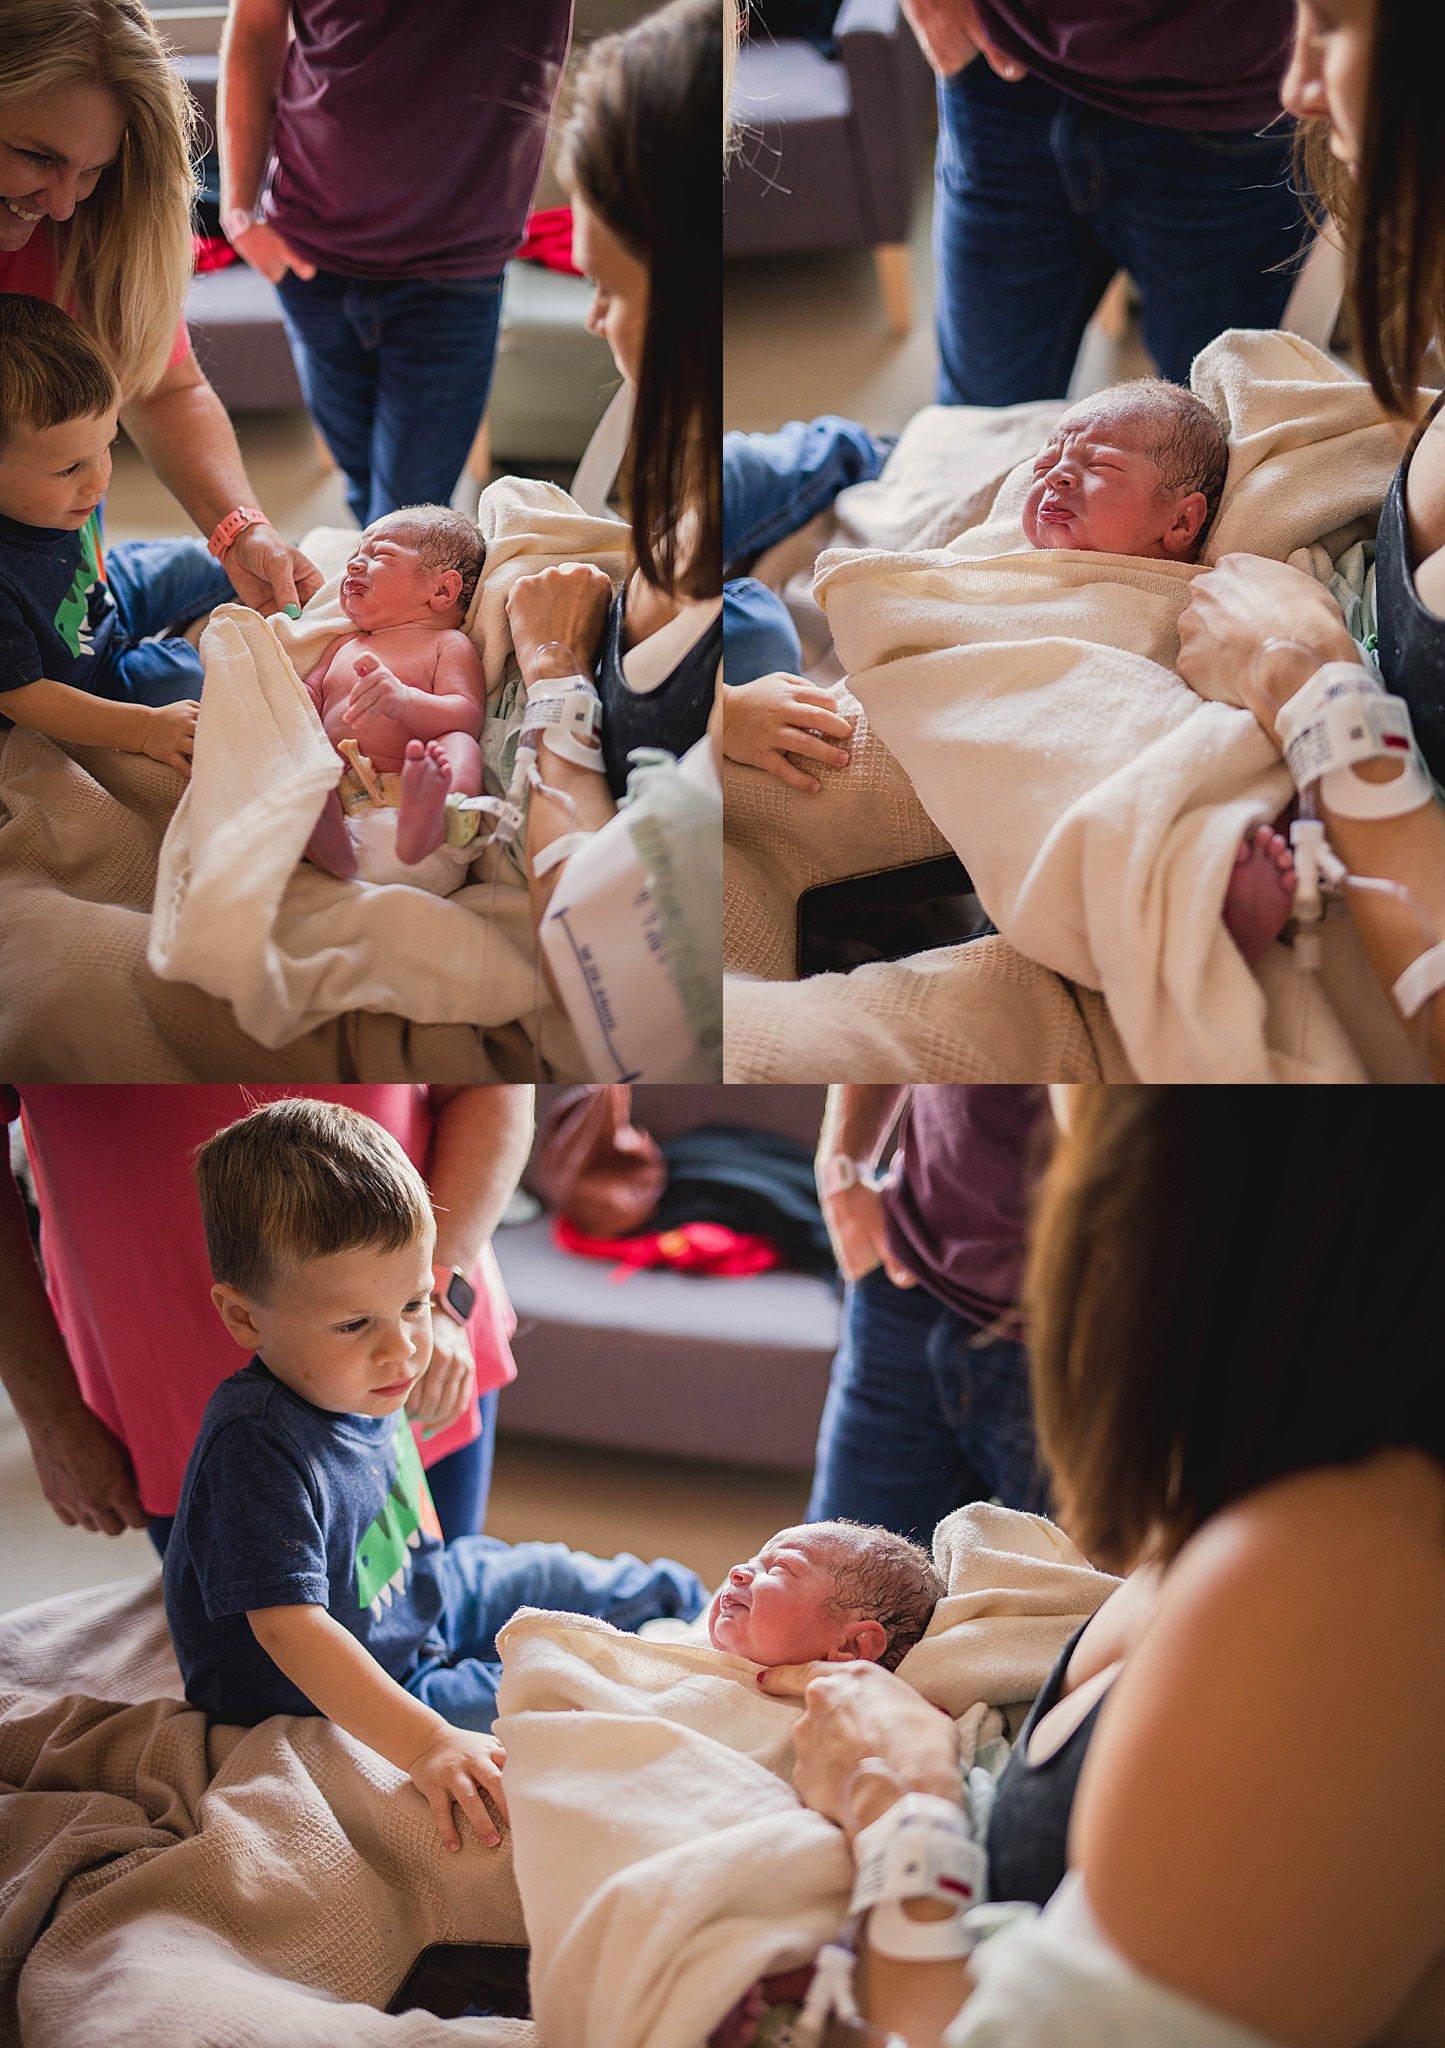 2019-03-16-hospital-baby-birth-photo-osage-beach-missouri-lake-1.jpg